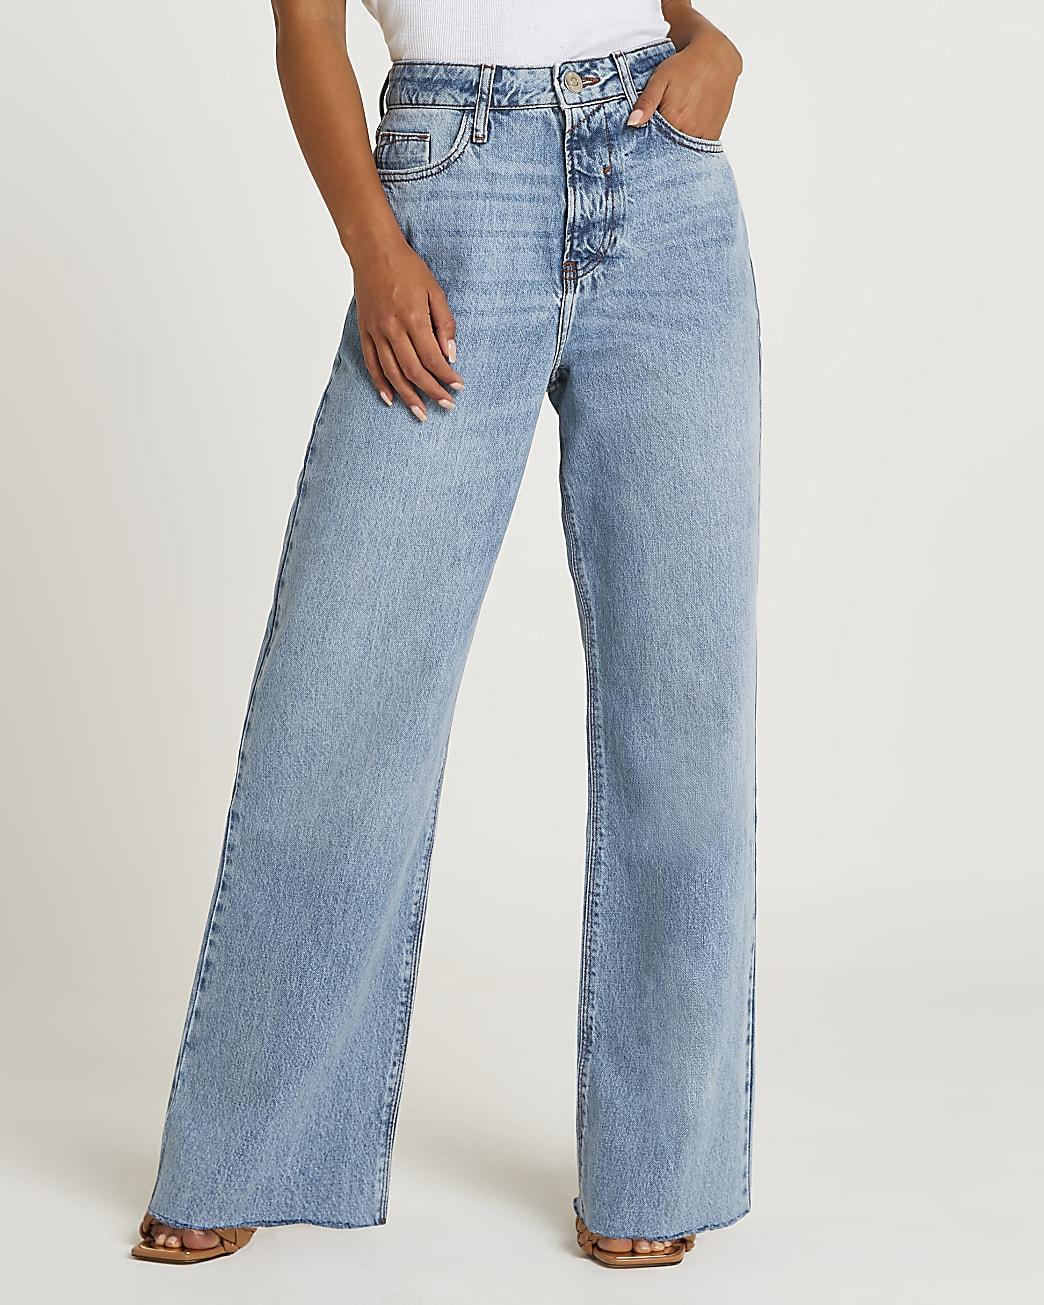 Petite blue high waisted wide leg jeans